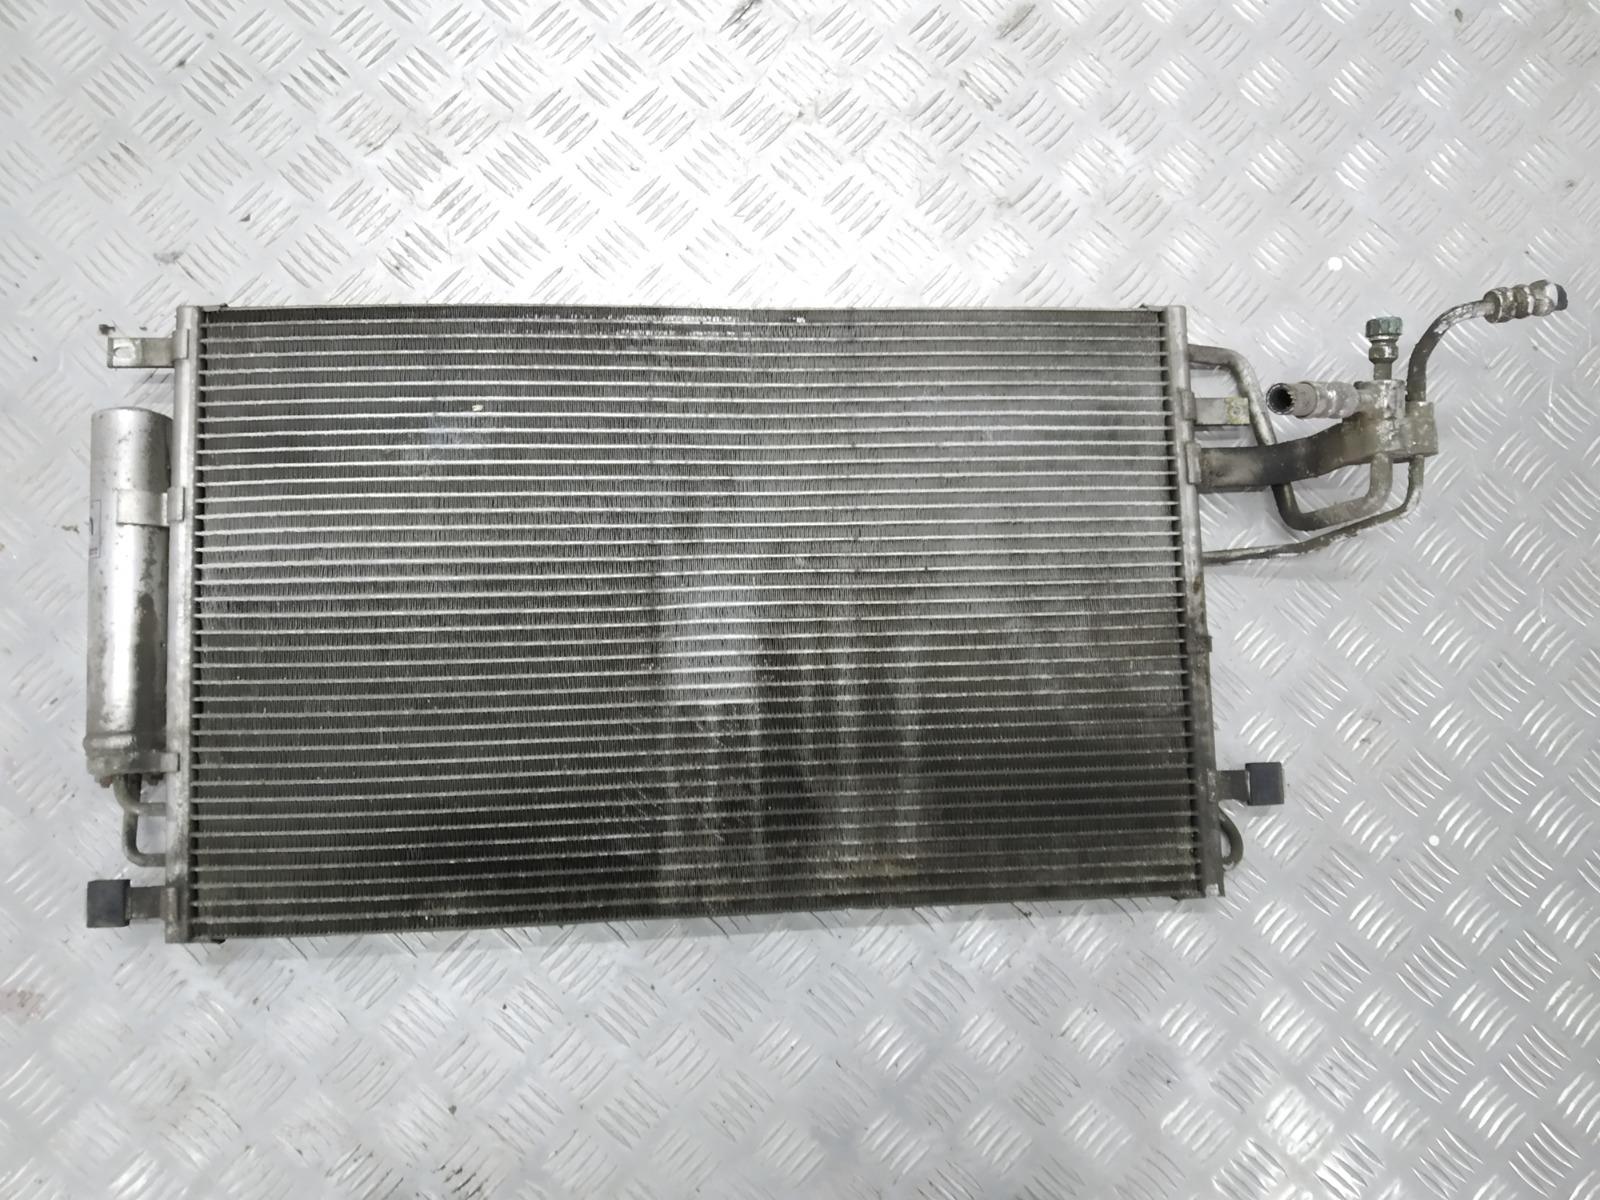 Радиатор кондиционера Hyundai Tucson 2.0 CRDI 2005 (б/у)